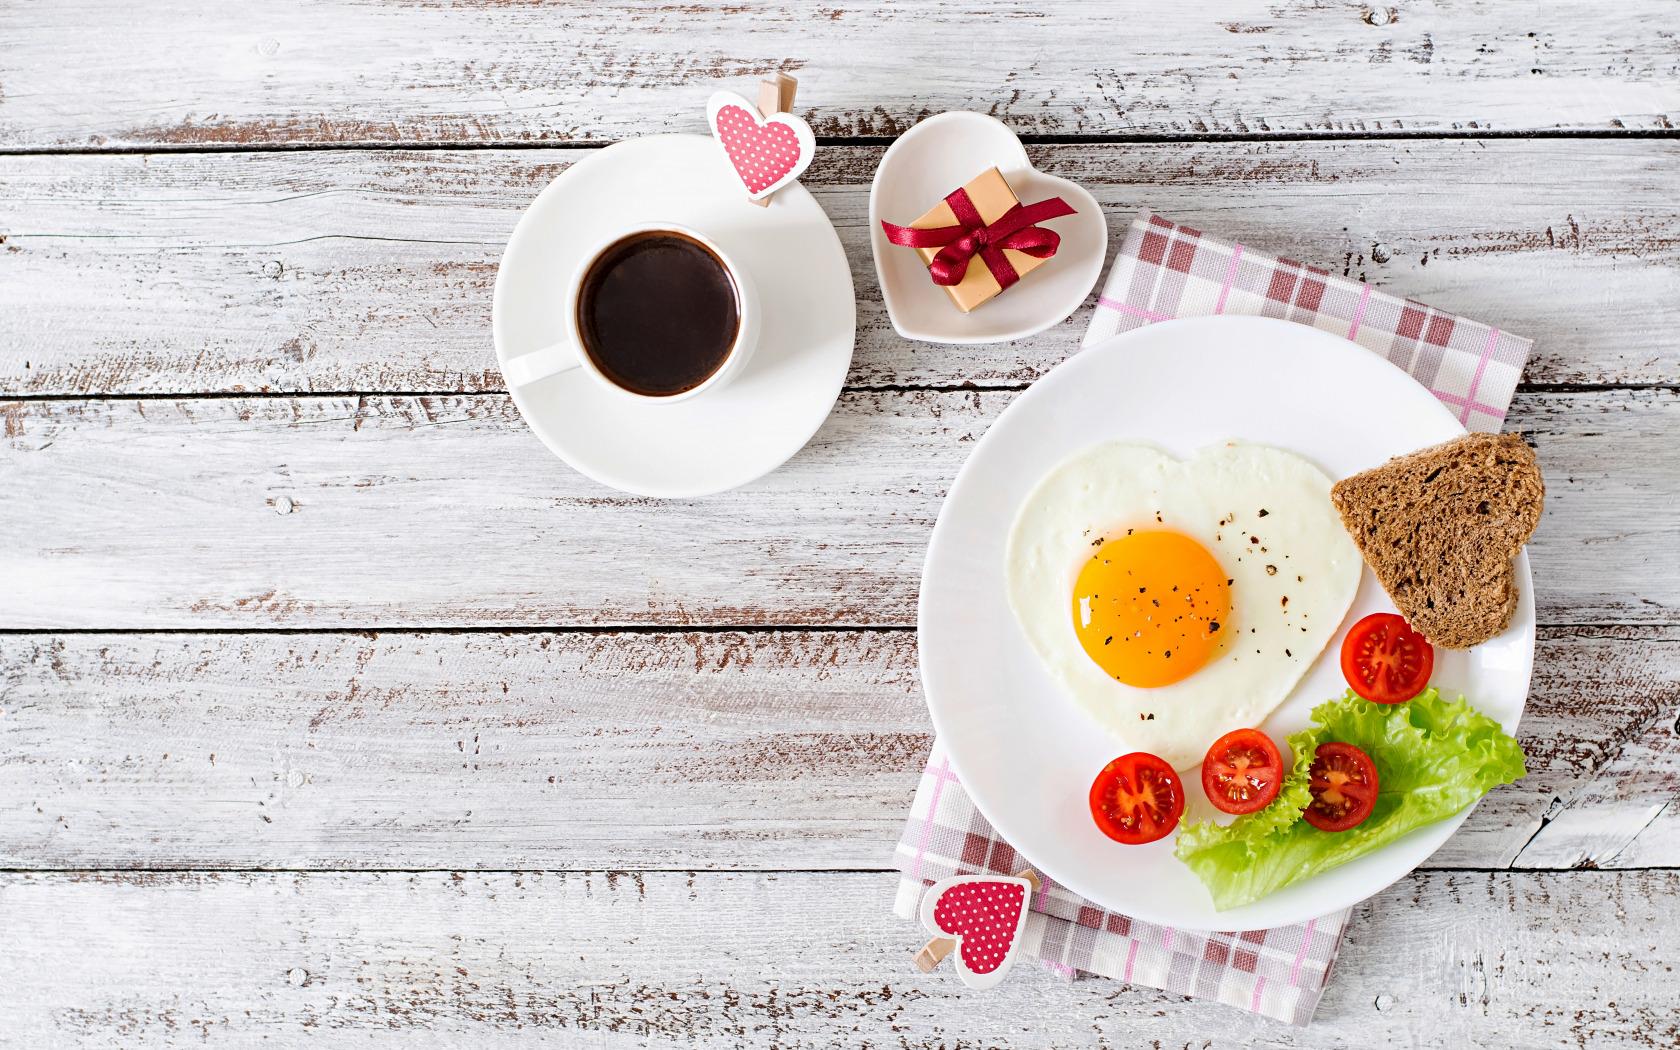 Яичница доброе утро картинки